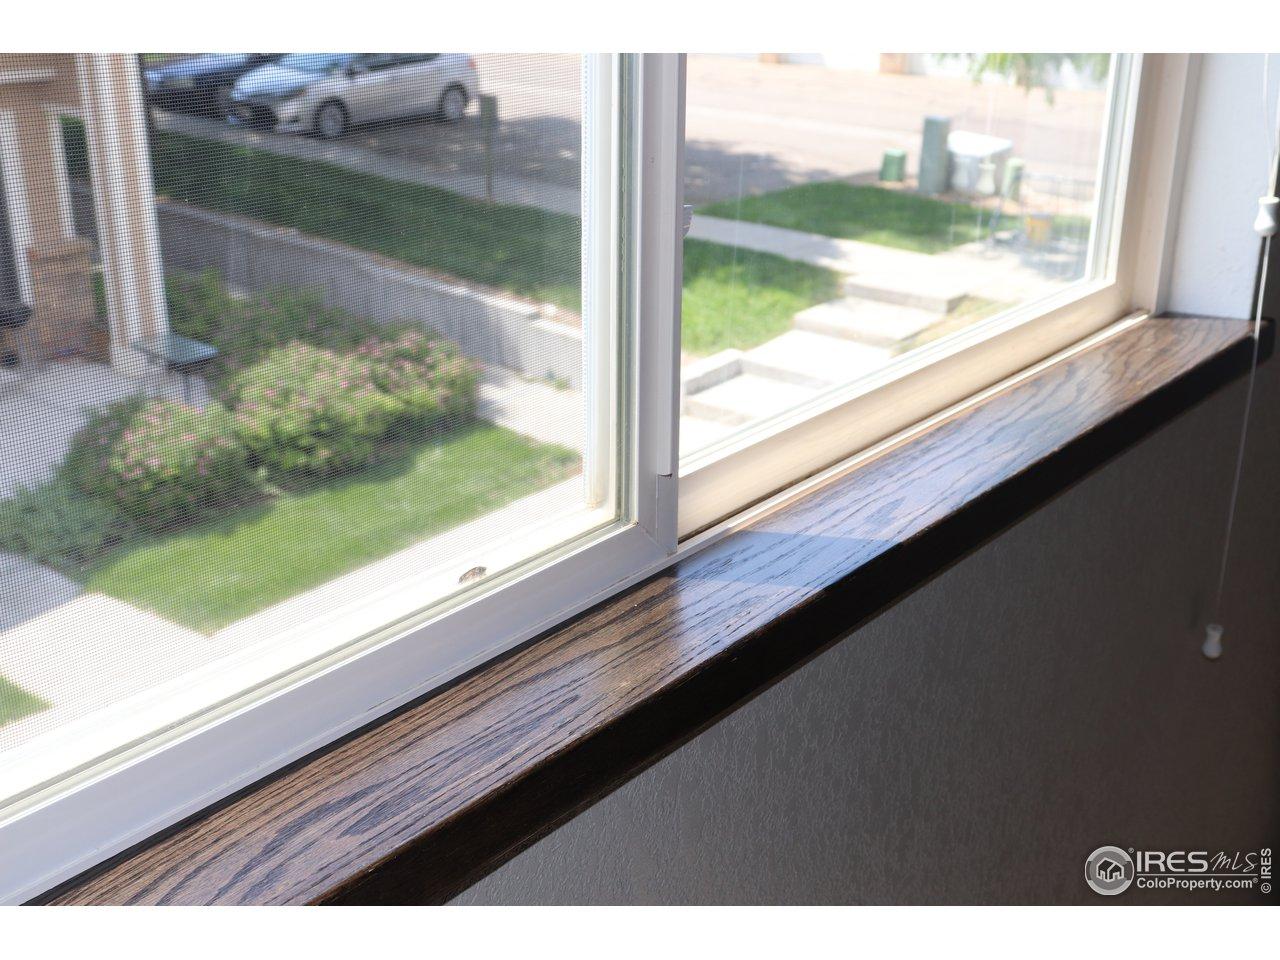 Custom Oak Window Sills that add a nice touch!